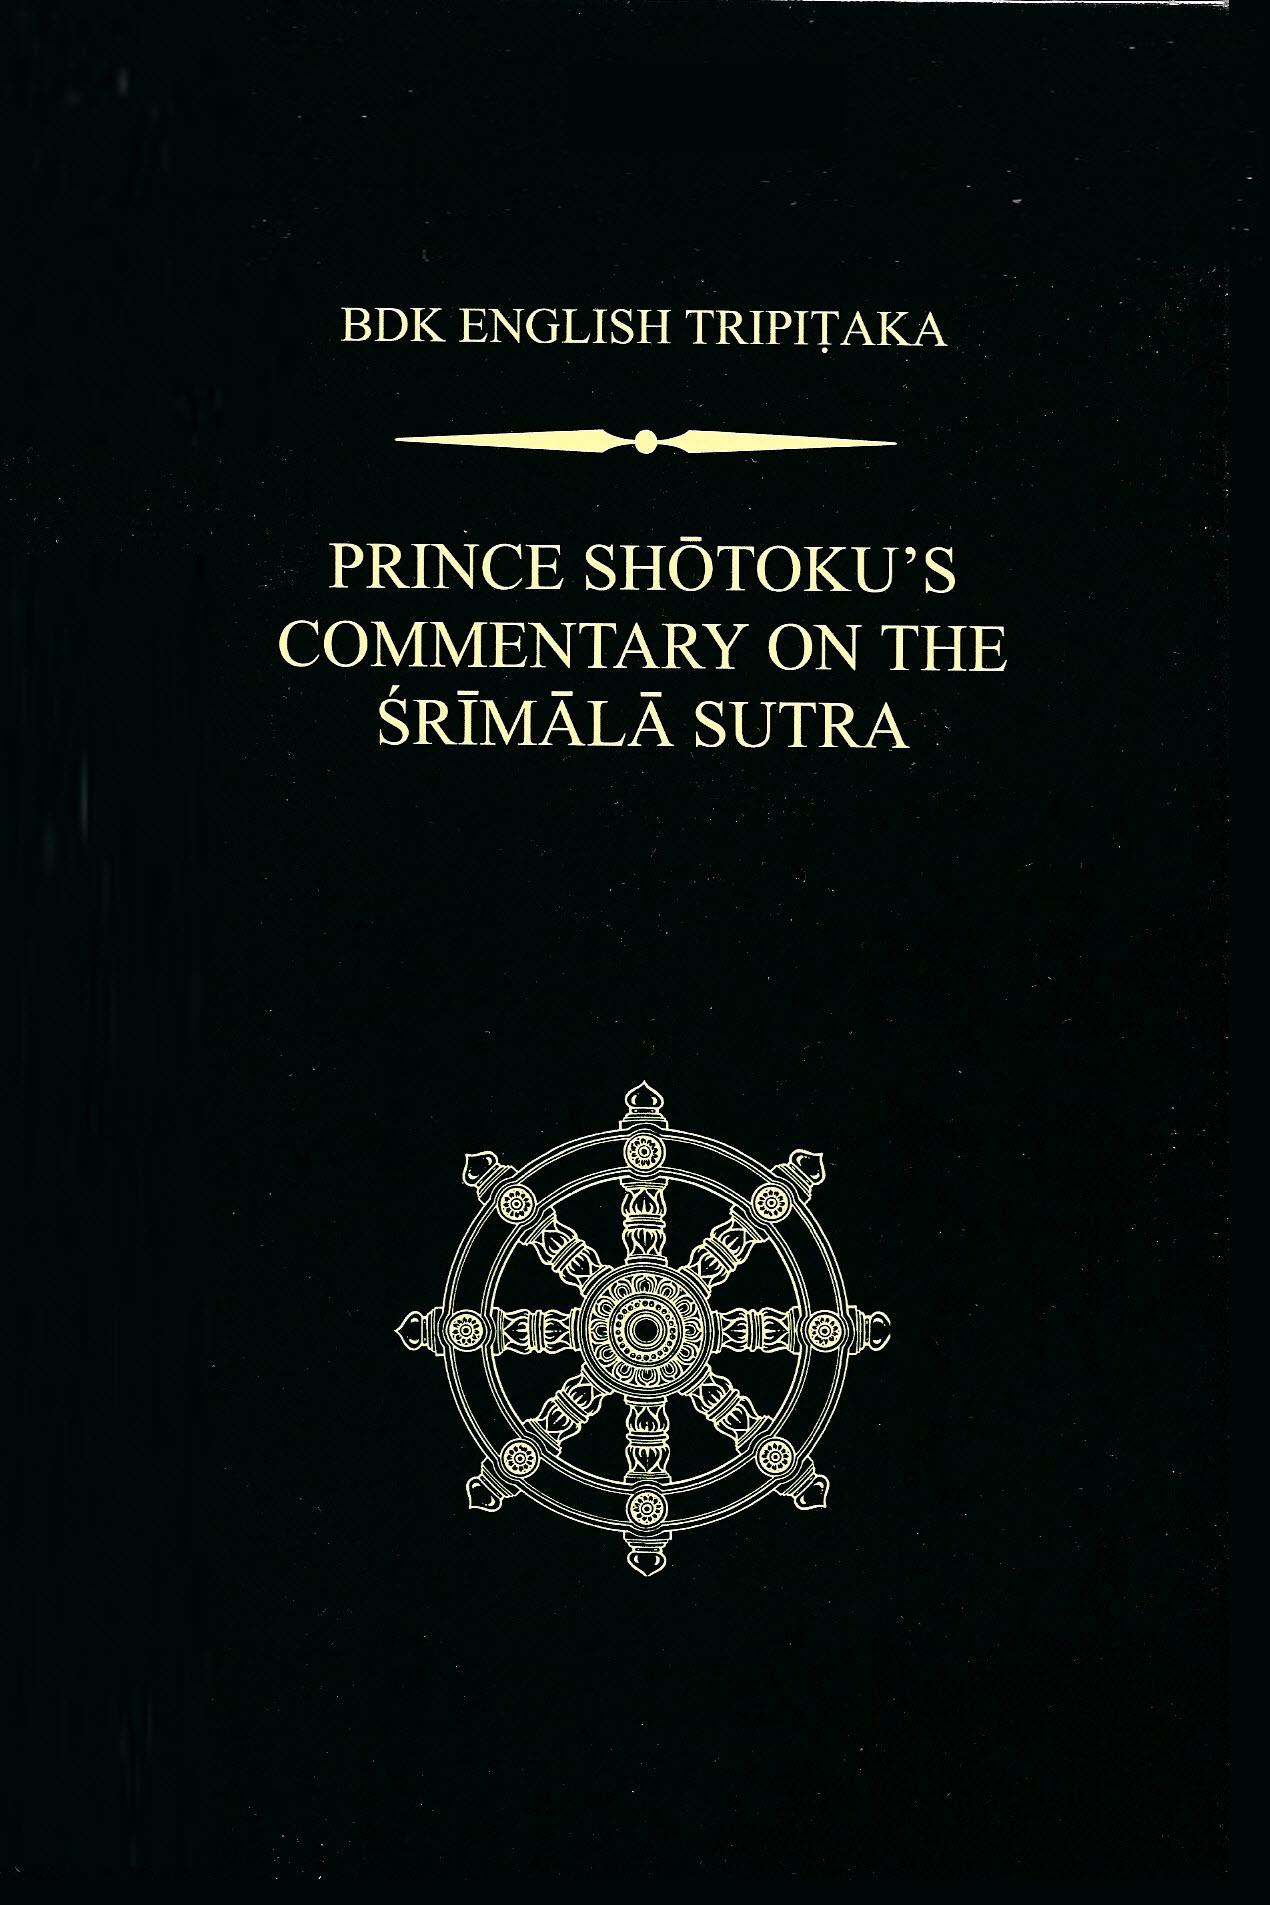 Shotoku's Commentary cover art